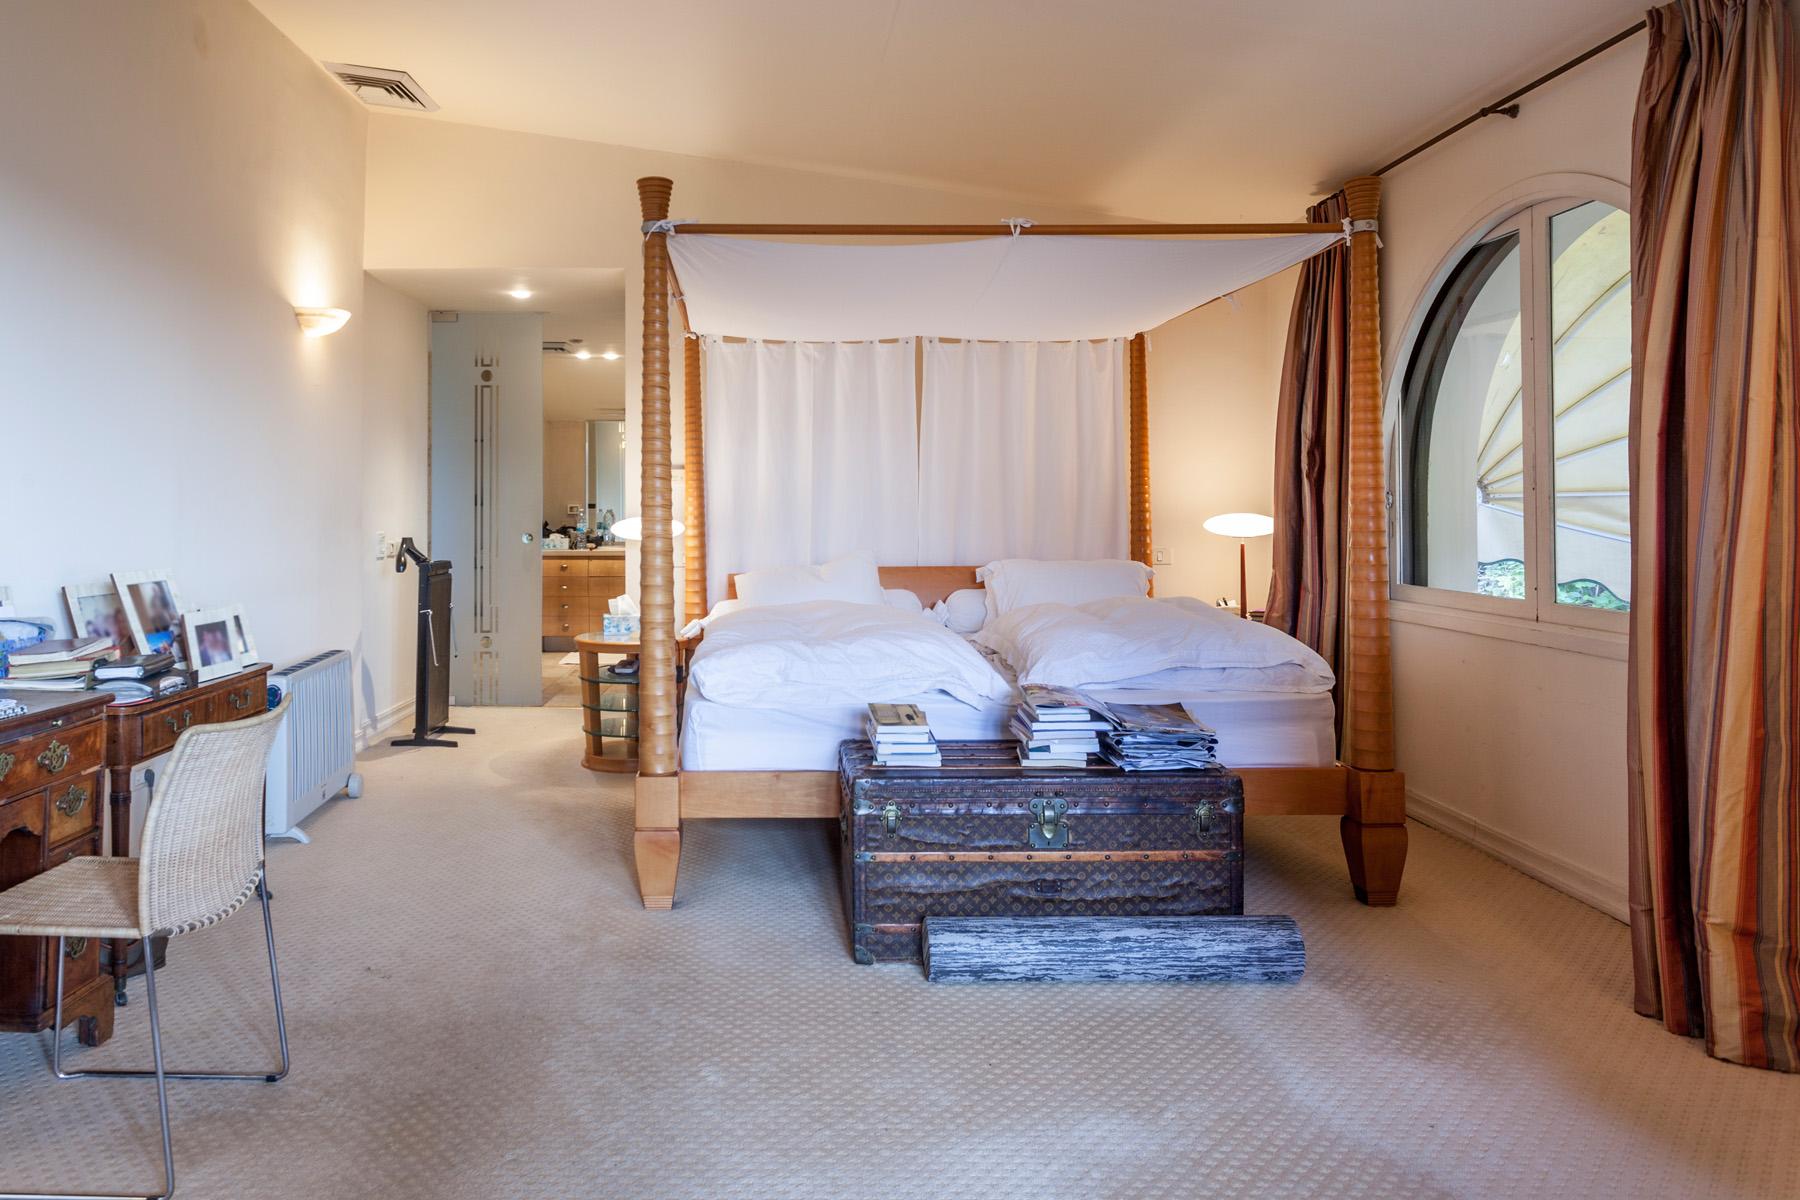 Additional photo for property listing at Inviting Classical Villa near the Sea 荷兹利亚, 以色列 以色列